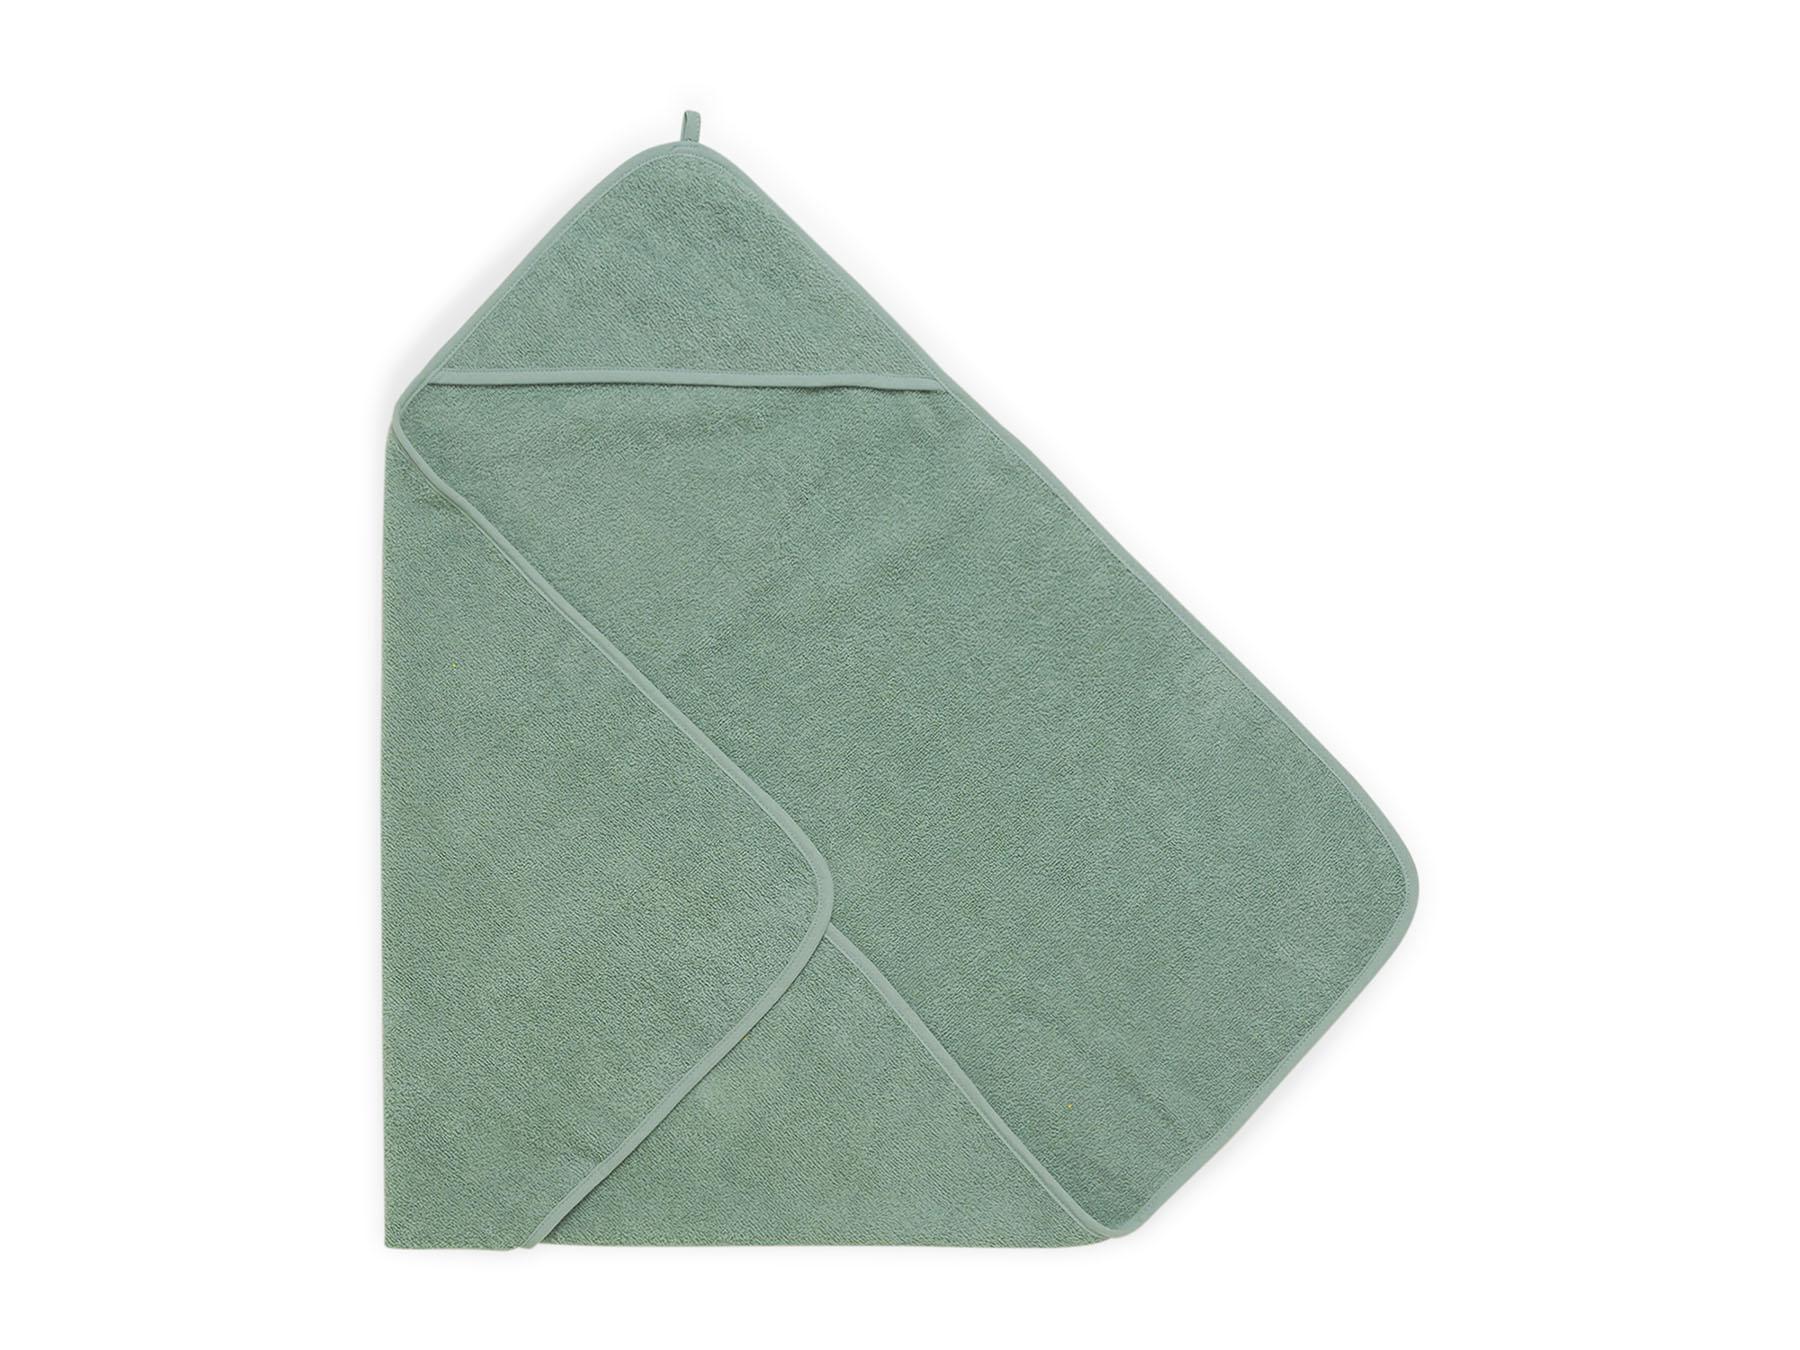 Afbeelding Jollein Badcape badstof 75x75cm I ash green